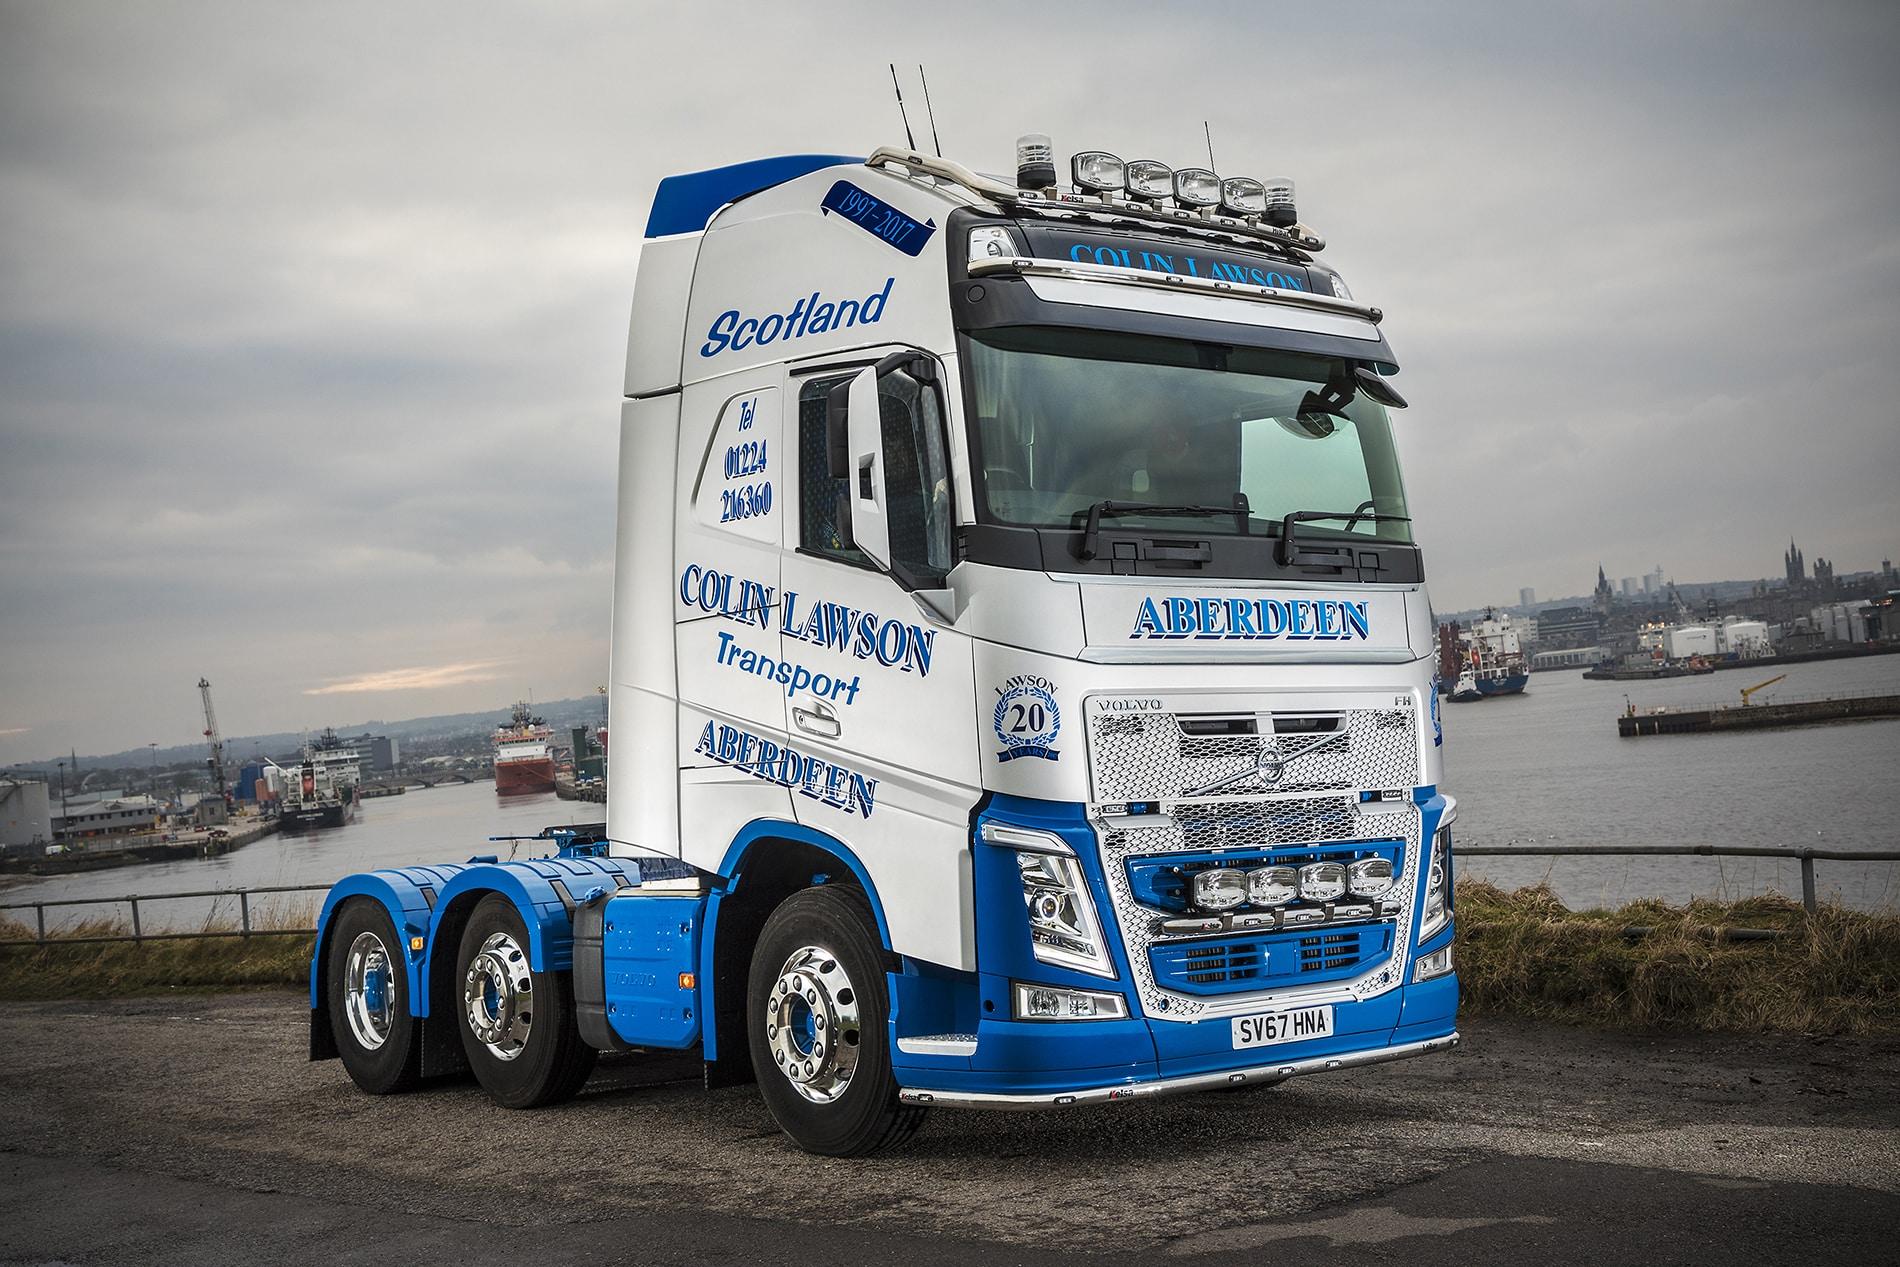 Colin Lawson Transport